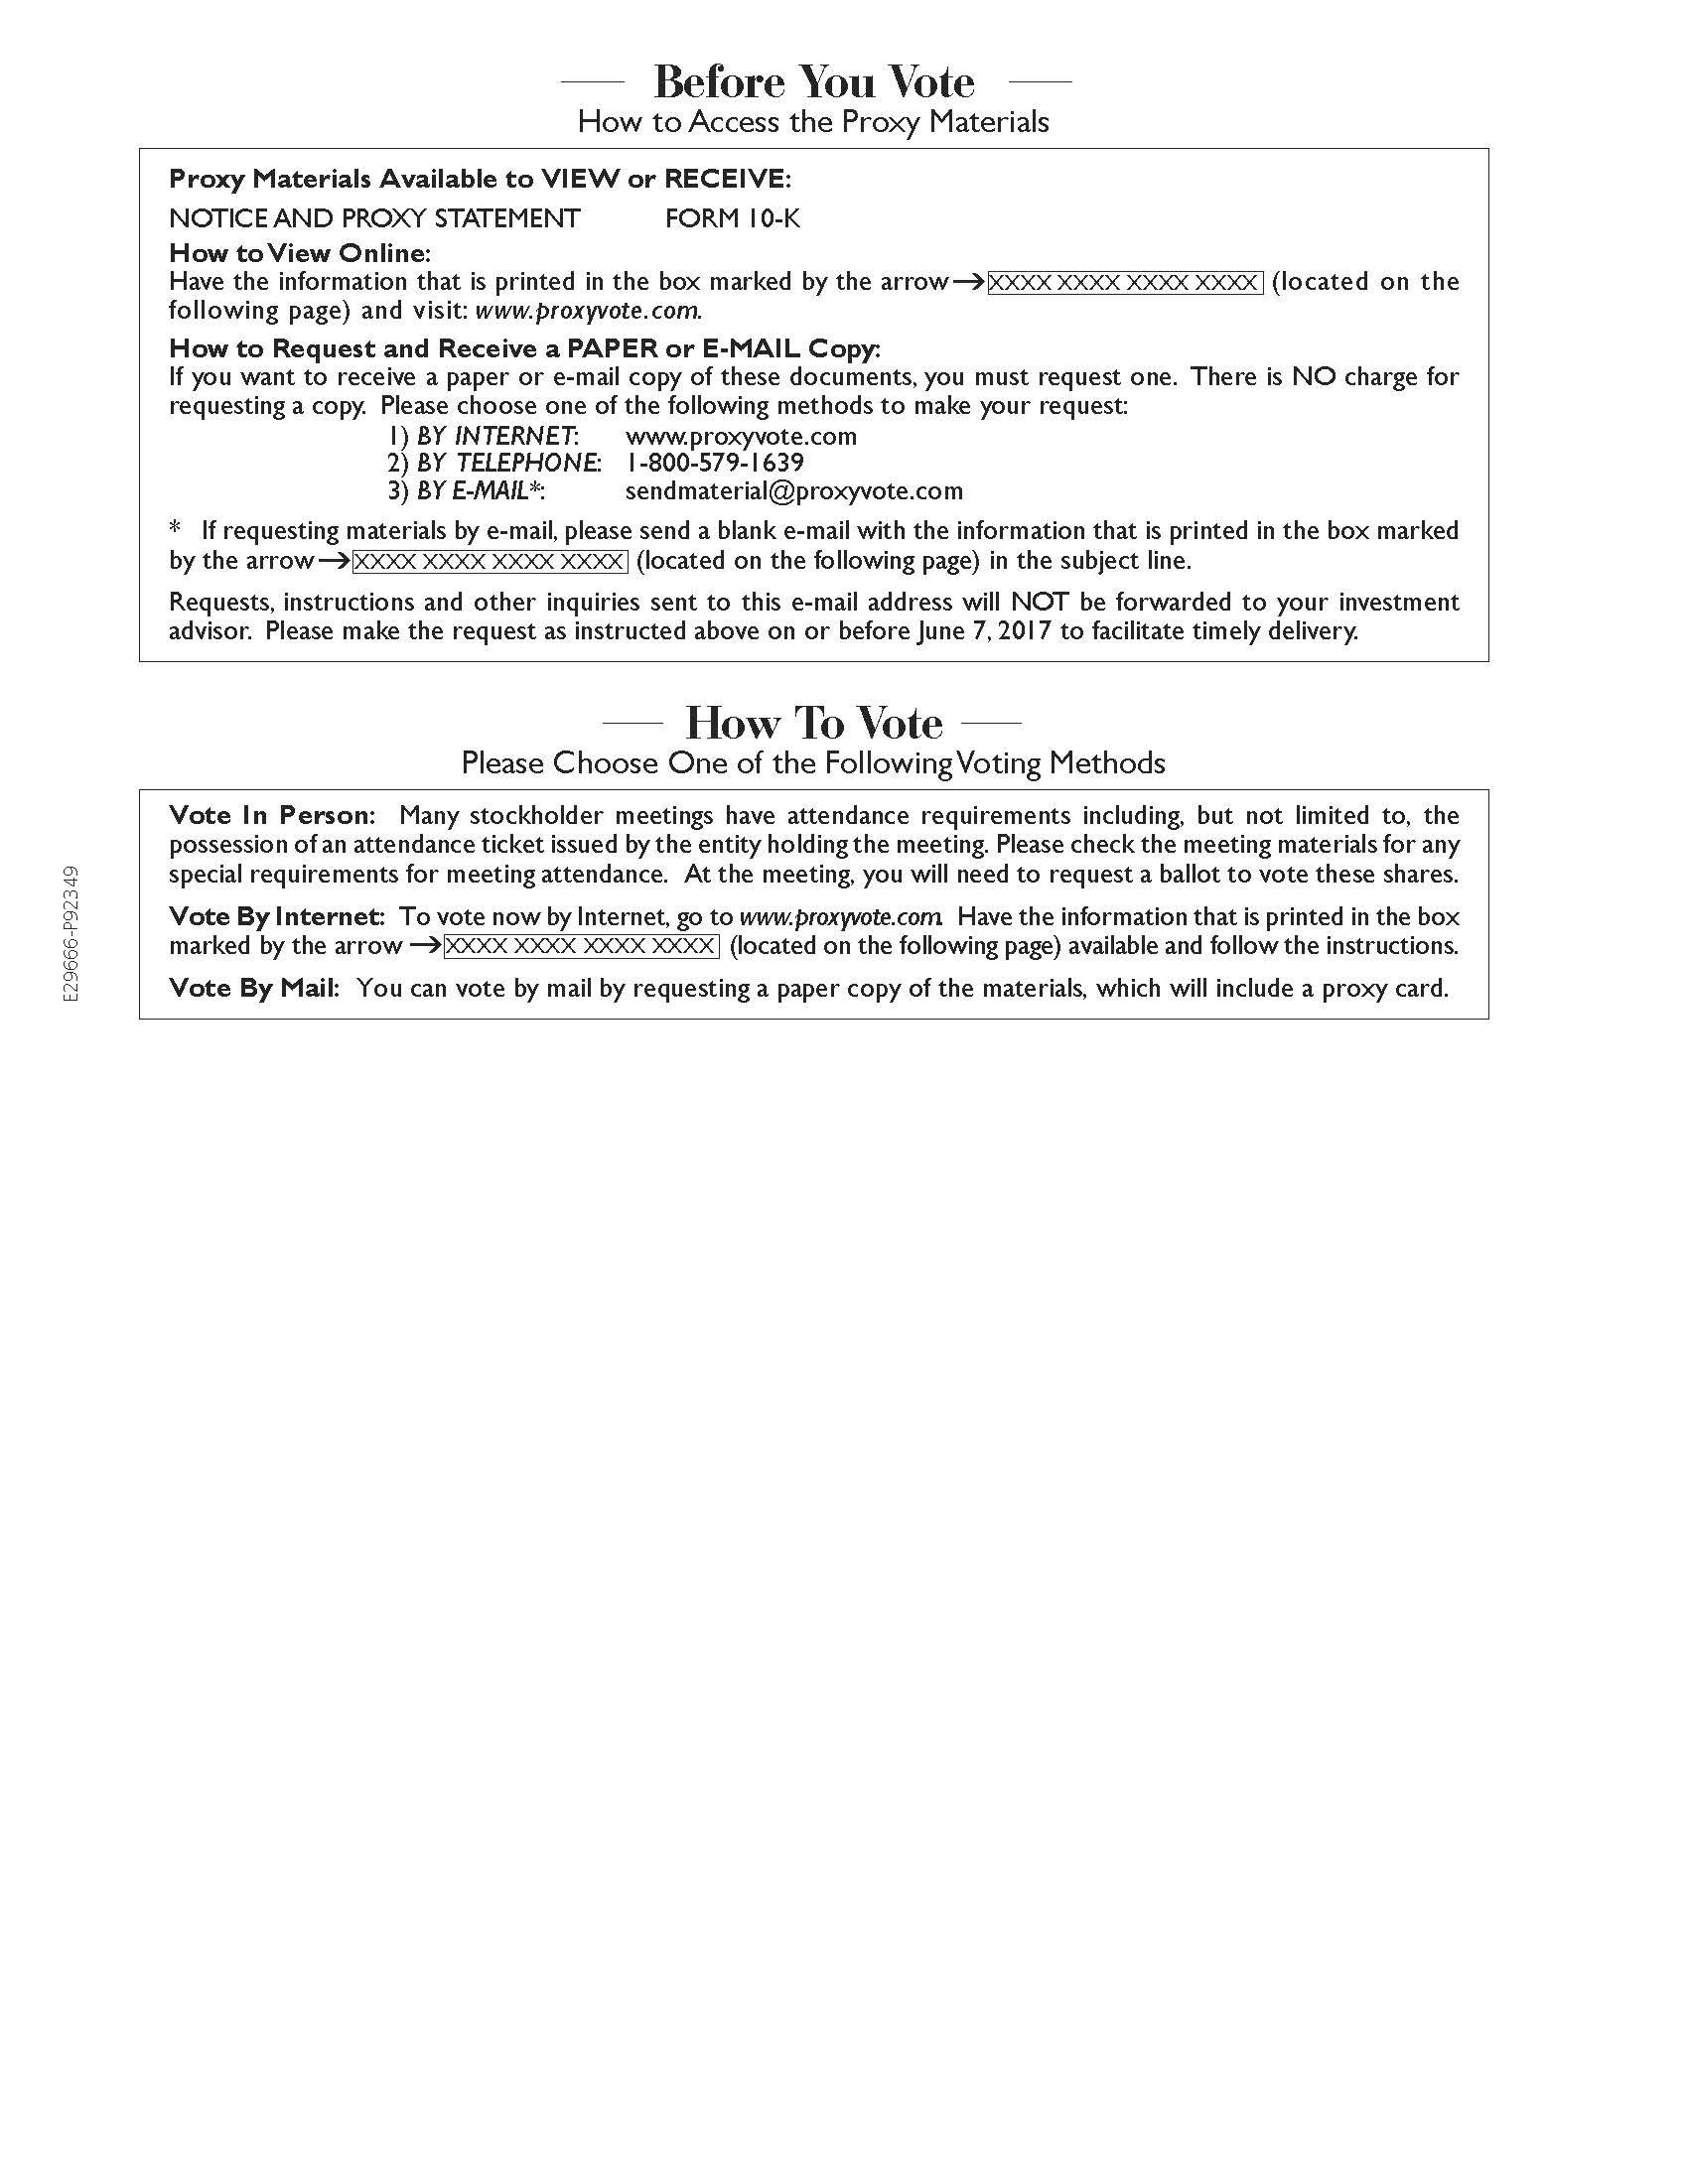 A2017EFNOTICEACCESSCARDFIN01.JPG